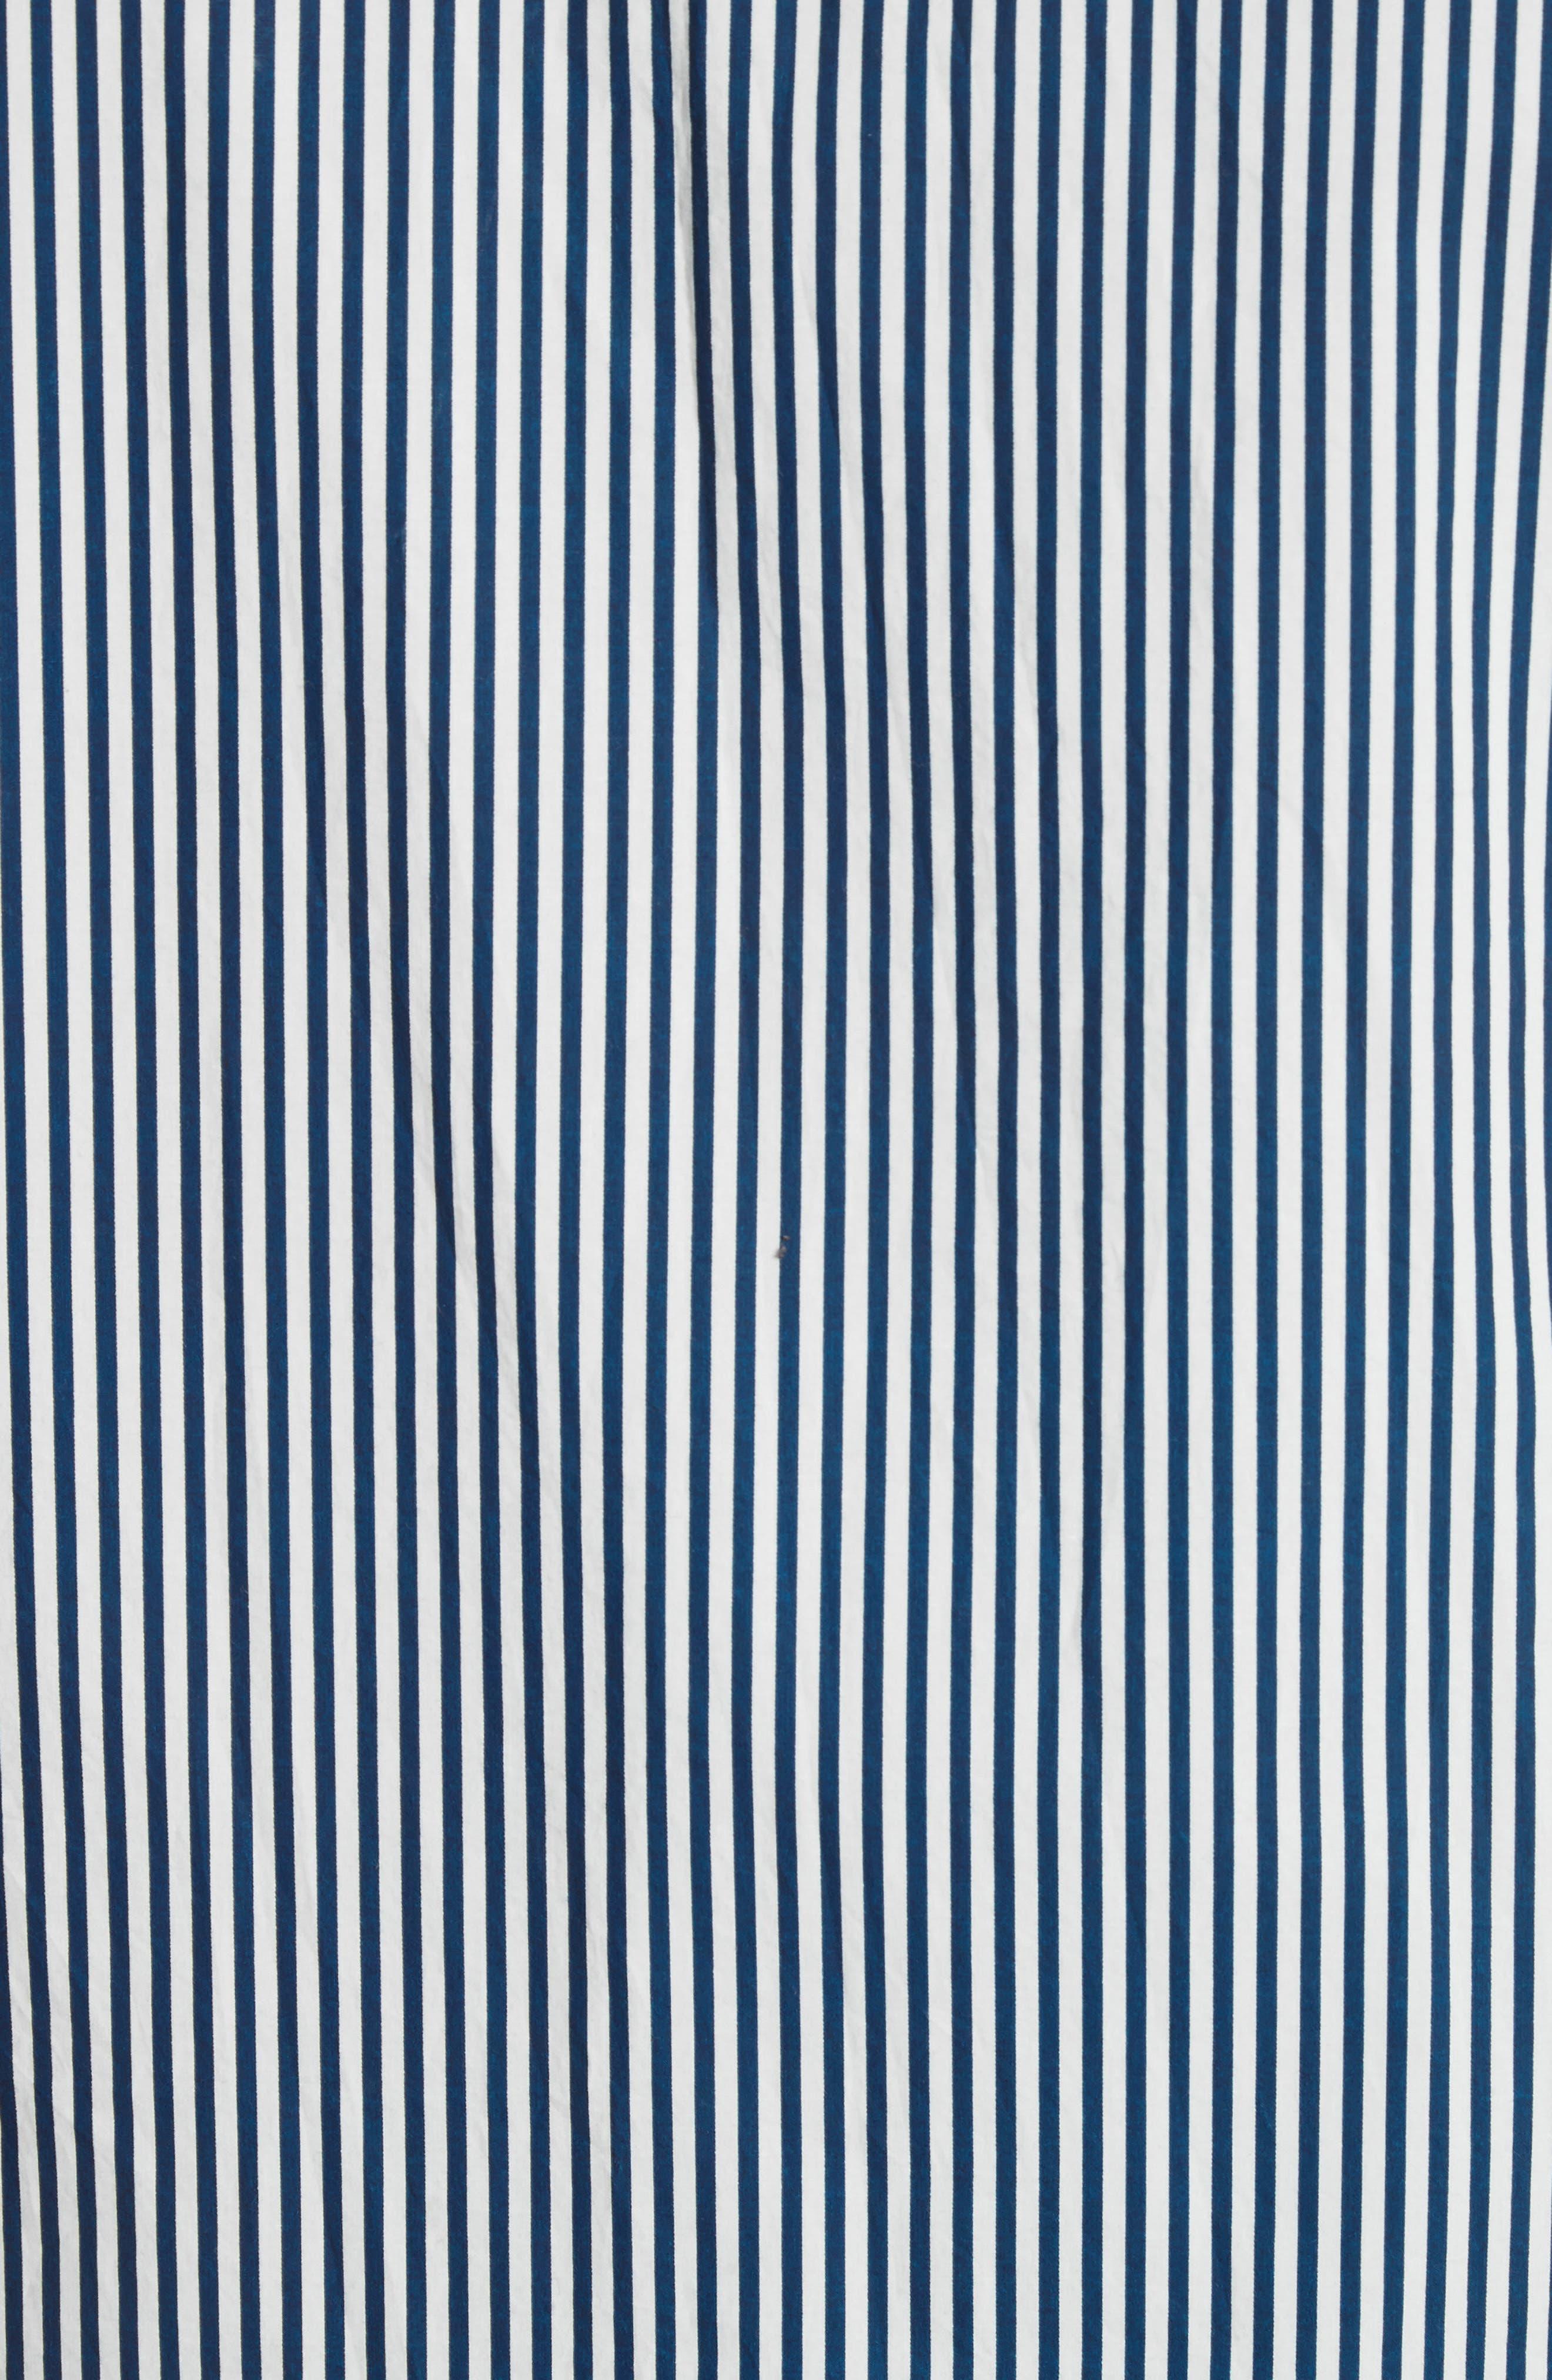 STONE ISLAND,                             Stripe Woven Shirt,                             Alternate thumbnail 5, color,                             100